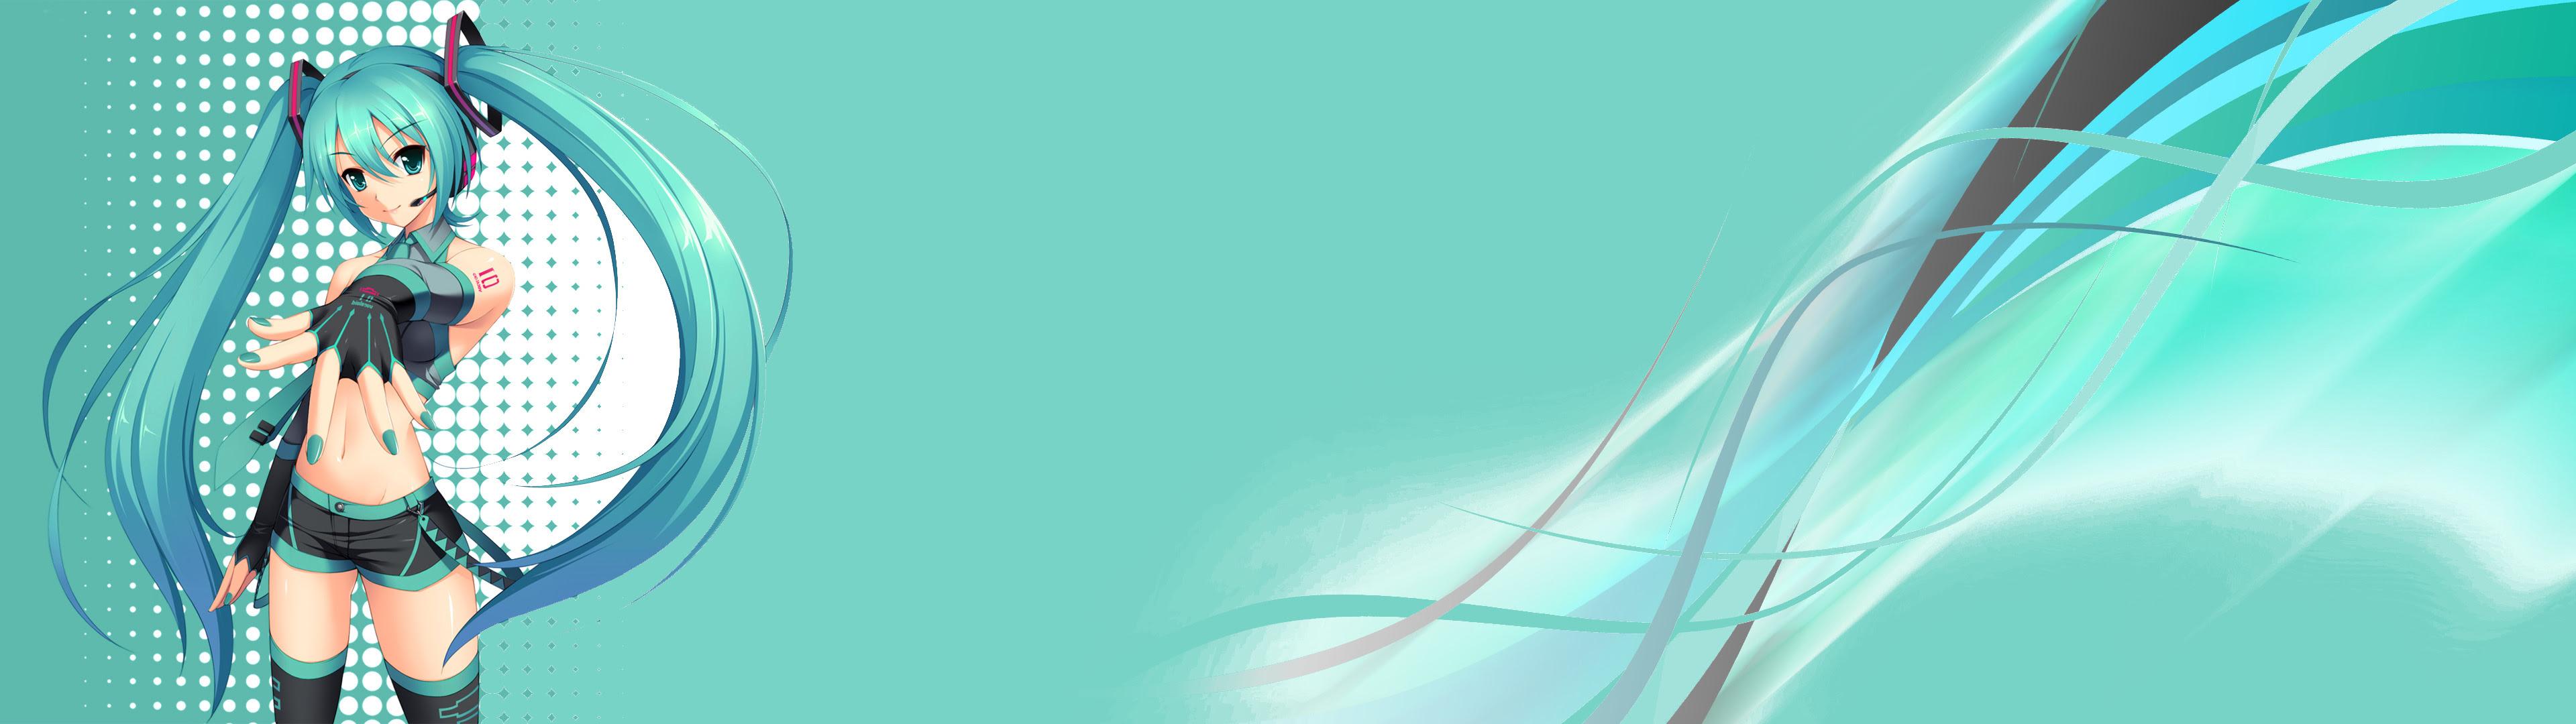 Anime Vocaloid Hatsune Miku Wallpapers Hd Desktop And Mobile